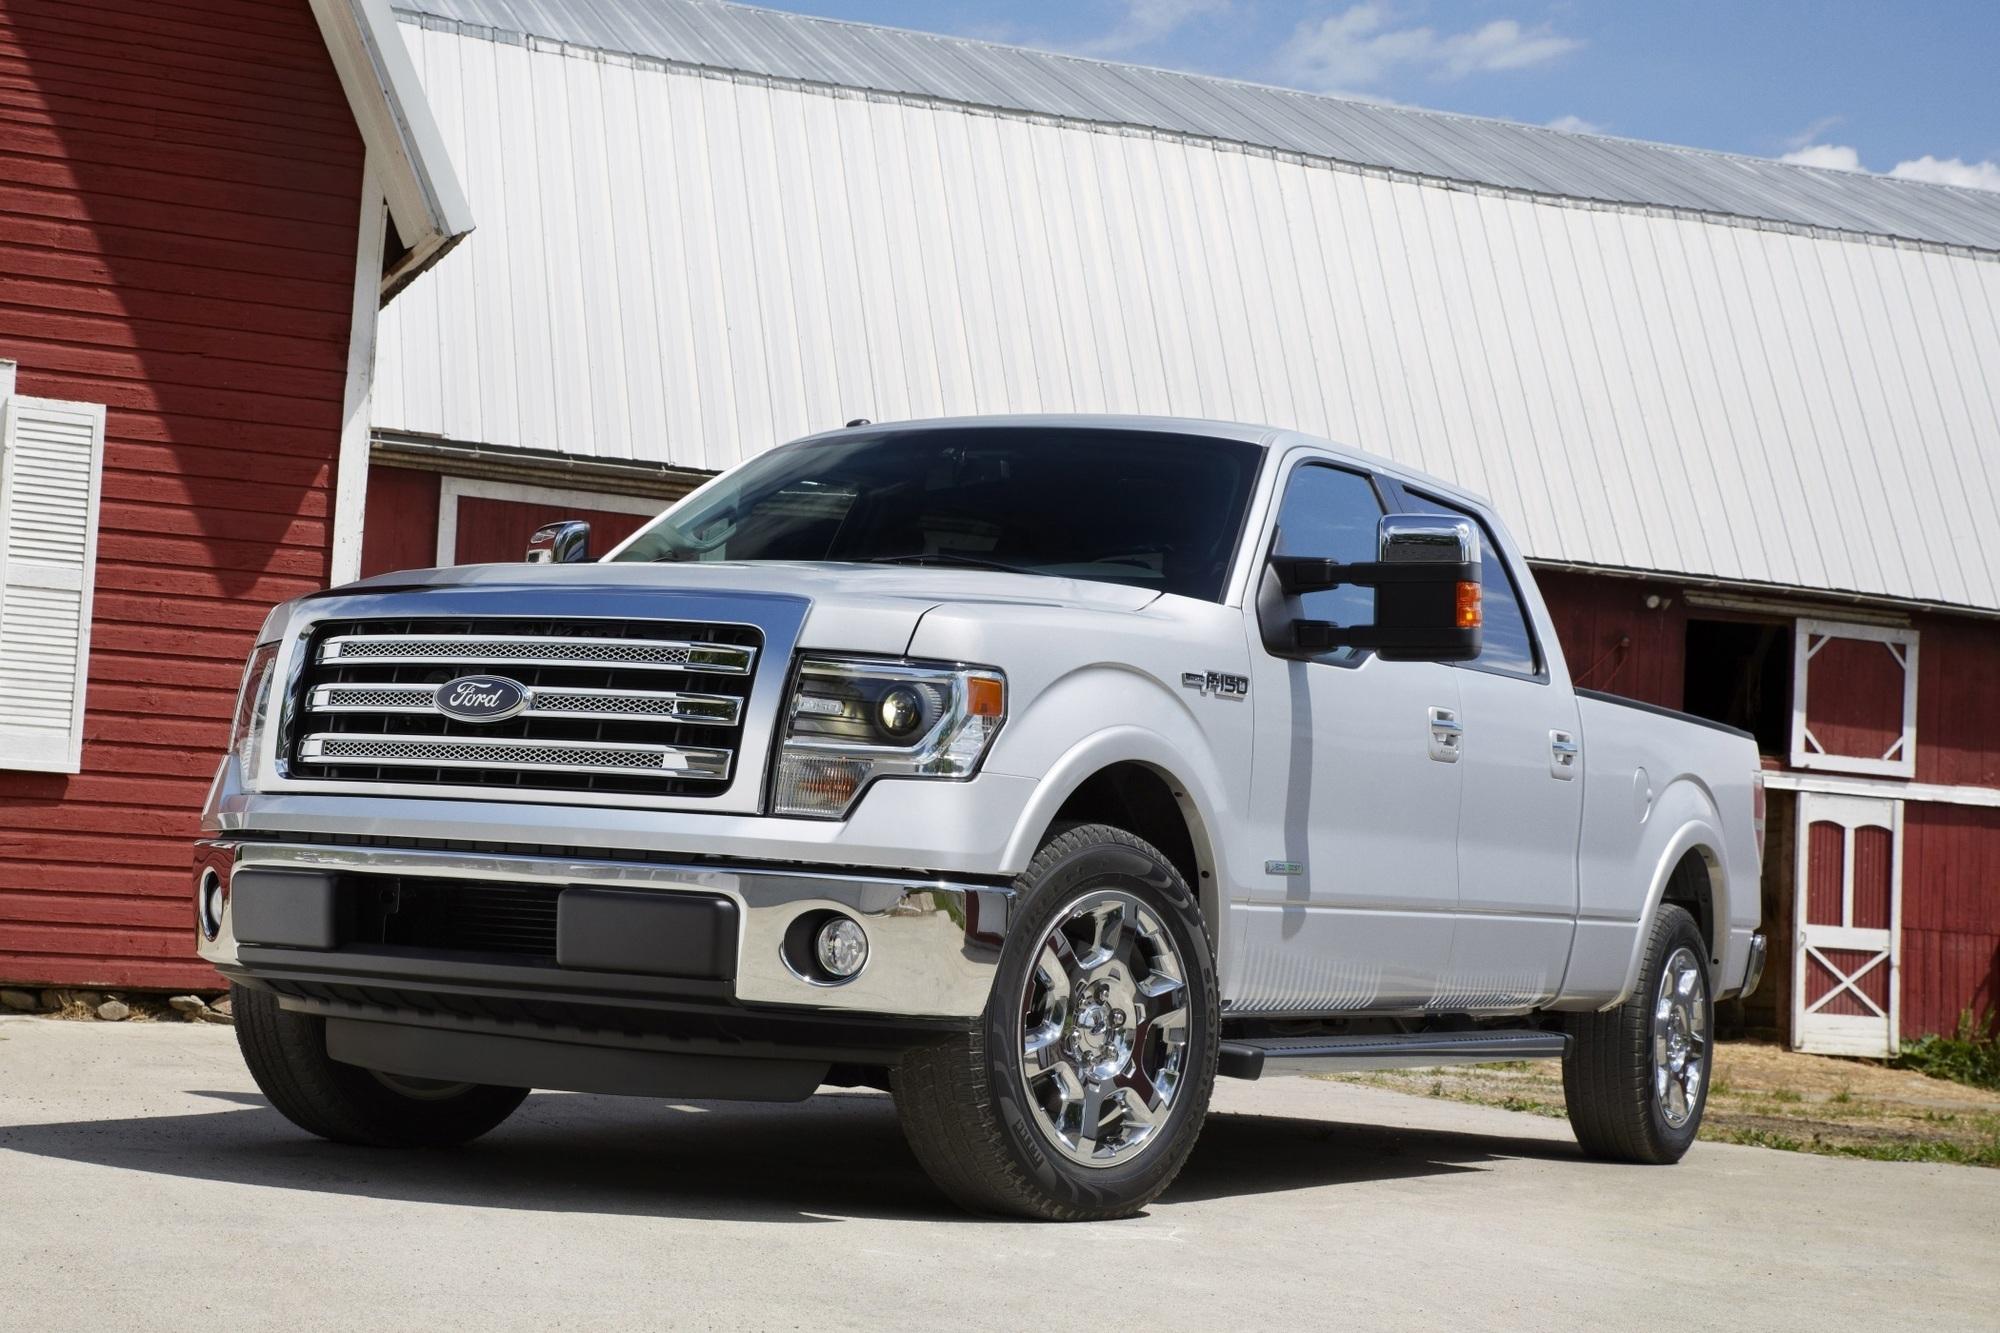 Panorama: Ford F – Amerikas Auto Nummer 1 - Die Lust am Laster